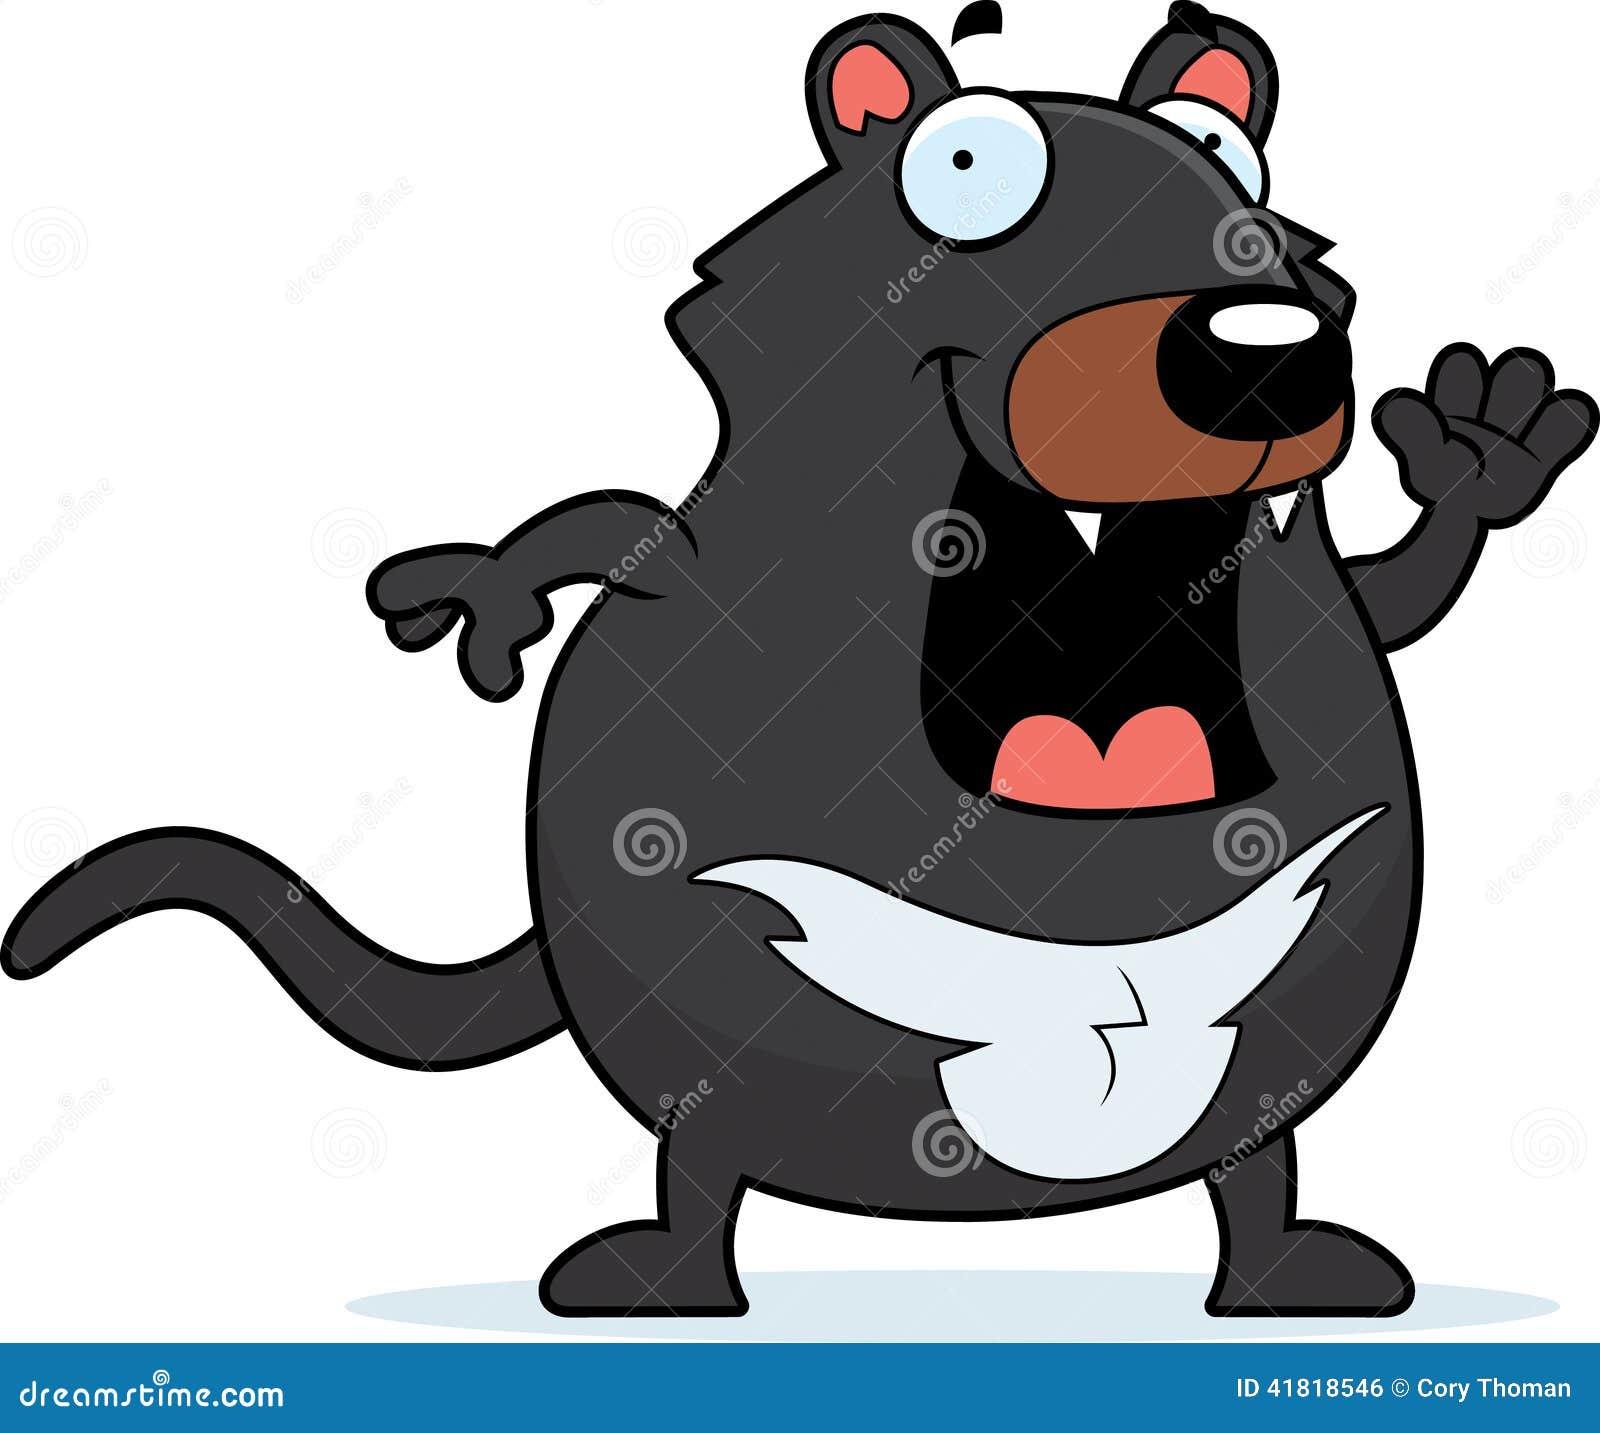 Cartoon Tasmanian Devil Waving